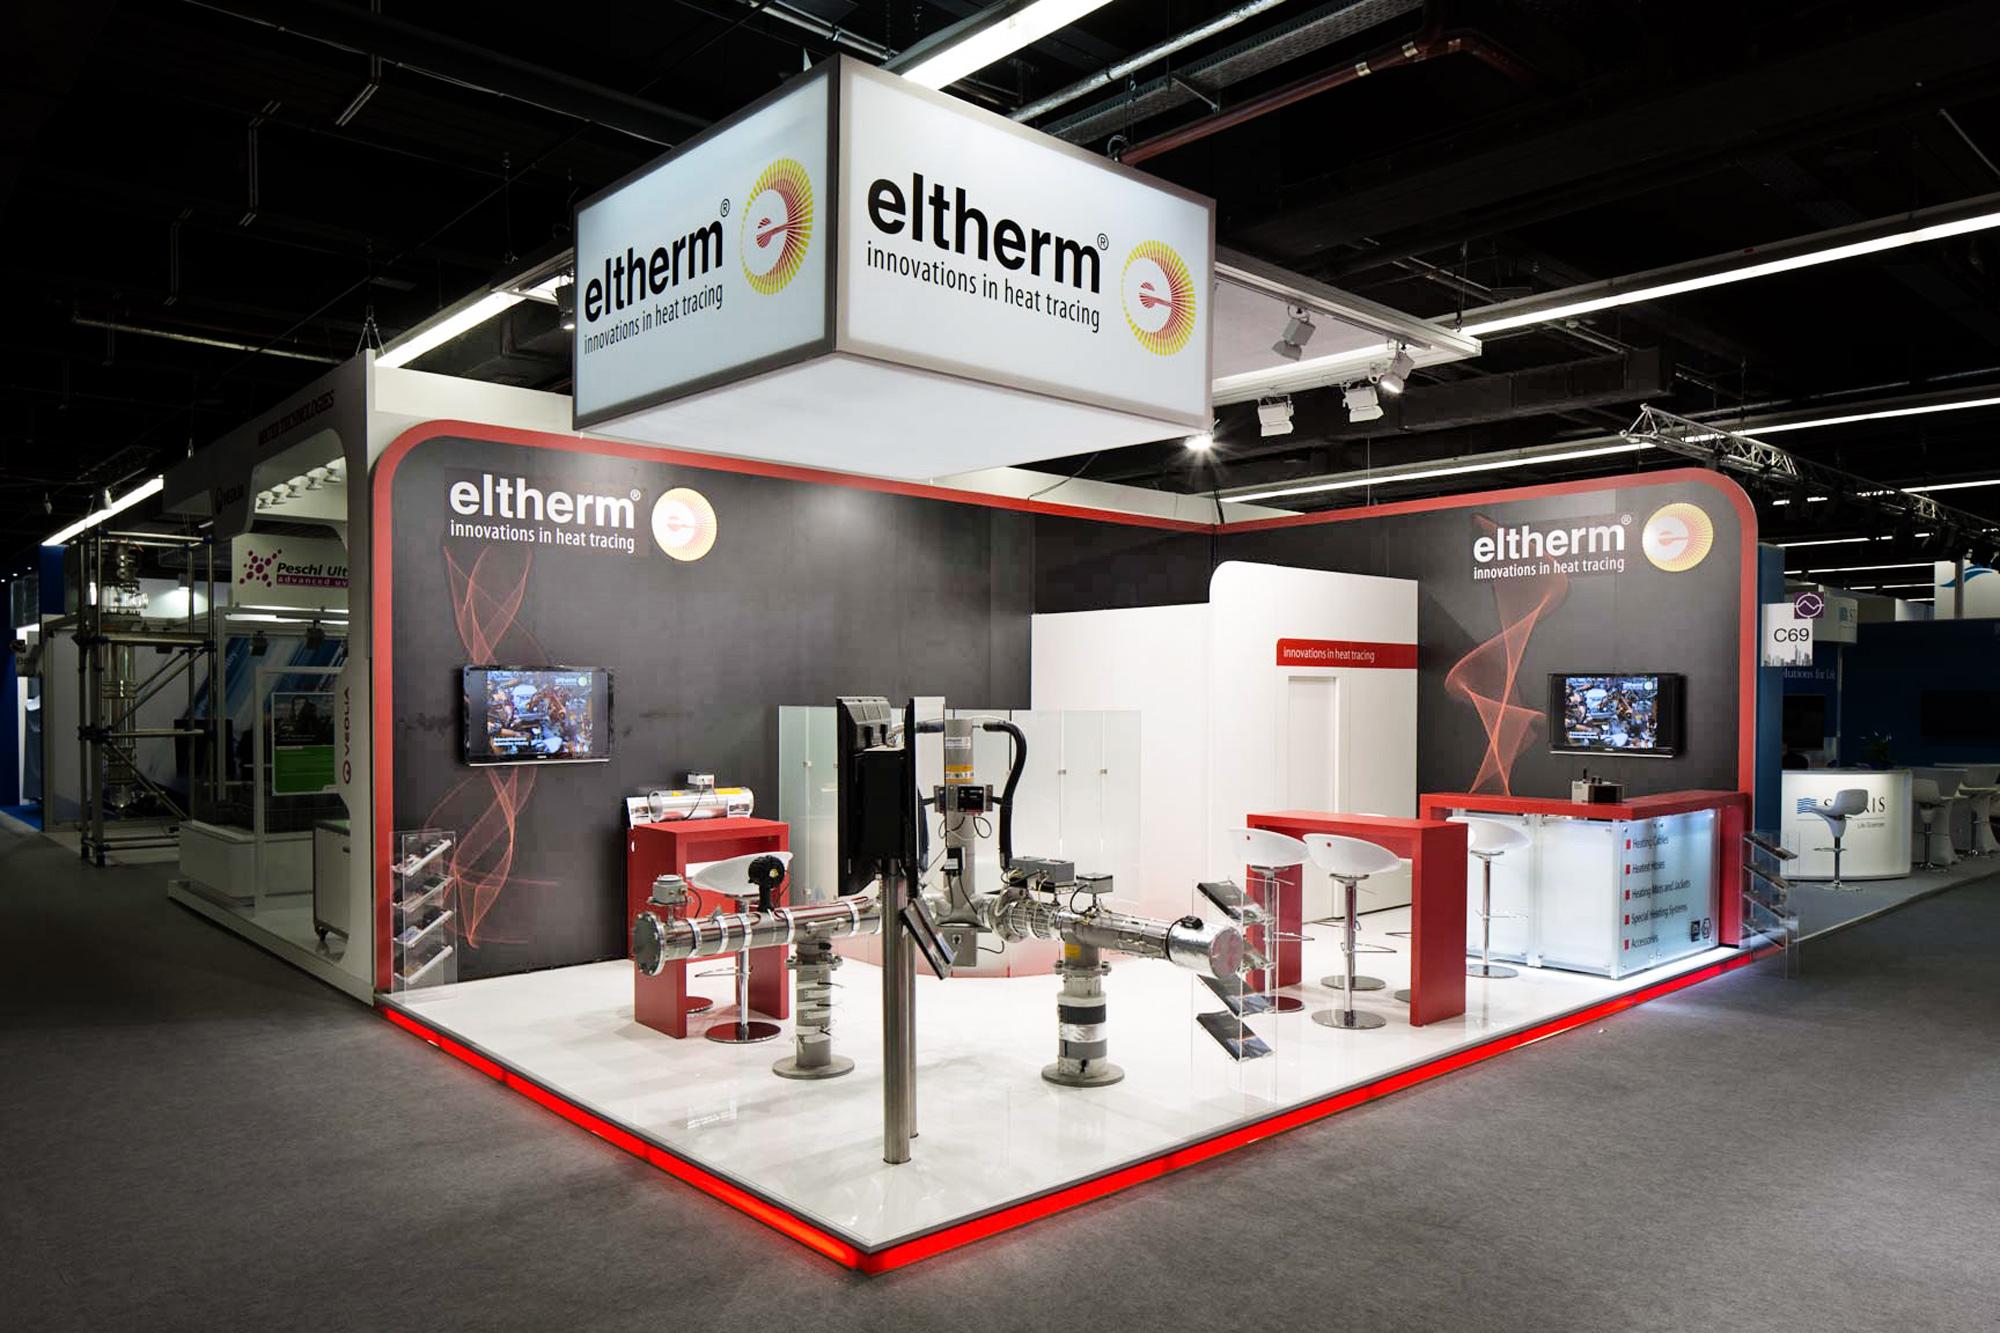 Messestand Eltherm Achema 2015 Frankfurt